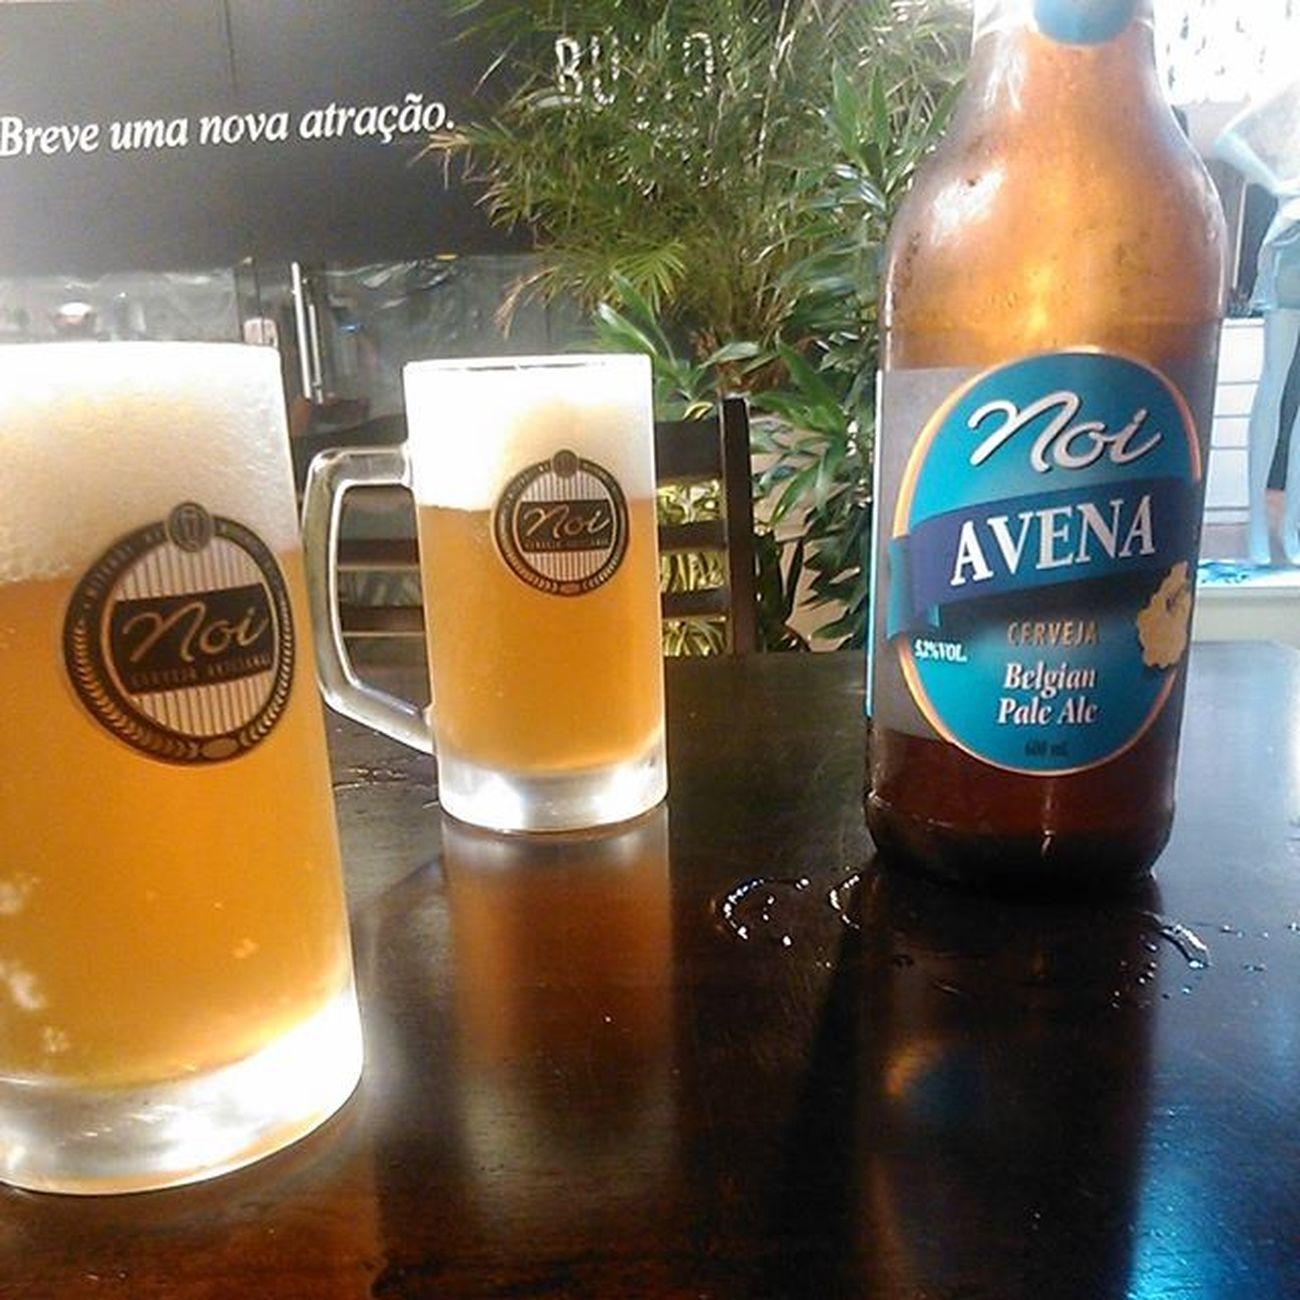 Breja Chopp Noi Noiavena Aveia Cerveza Semfiltro Buzios Errejota  RJ Buziosrj Brasil Brazil